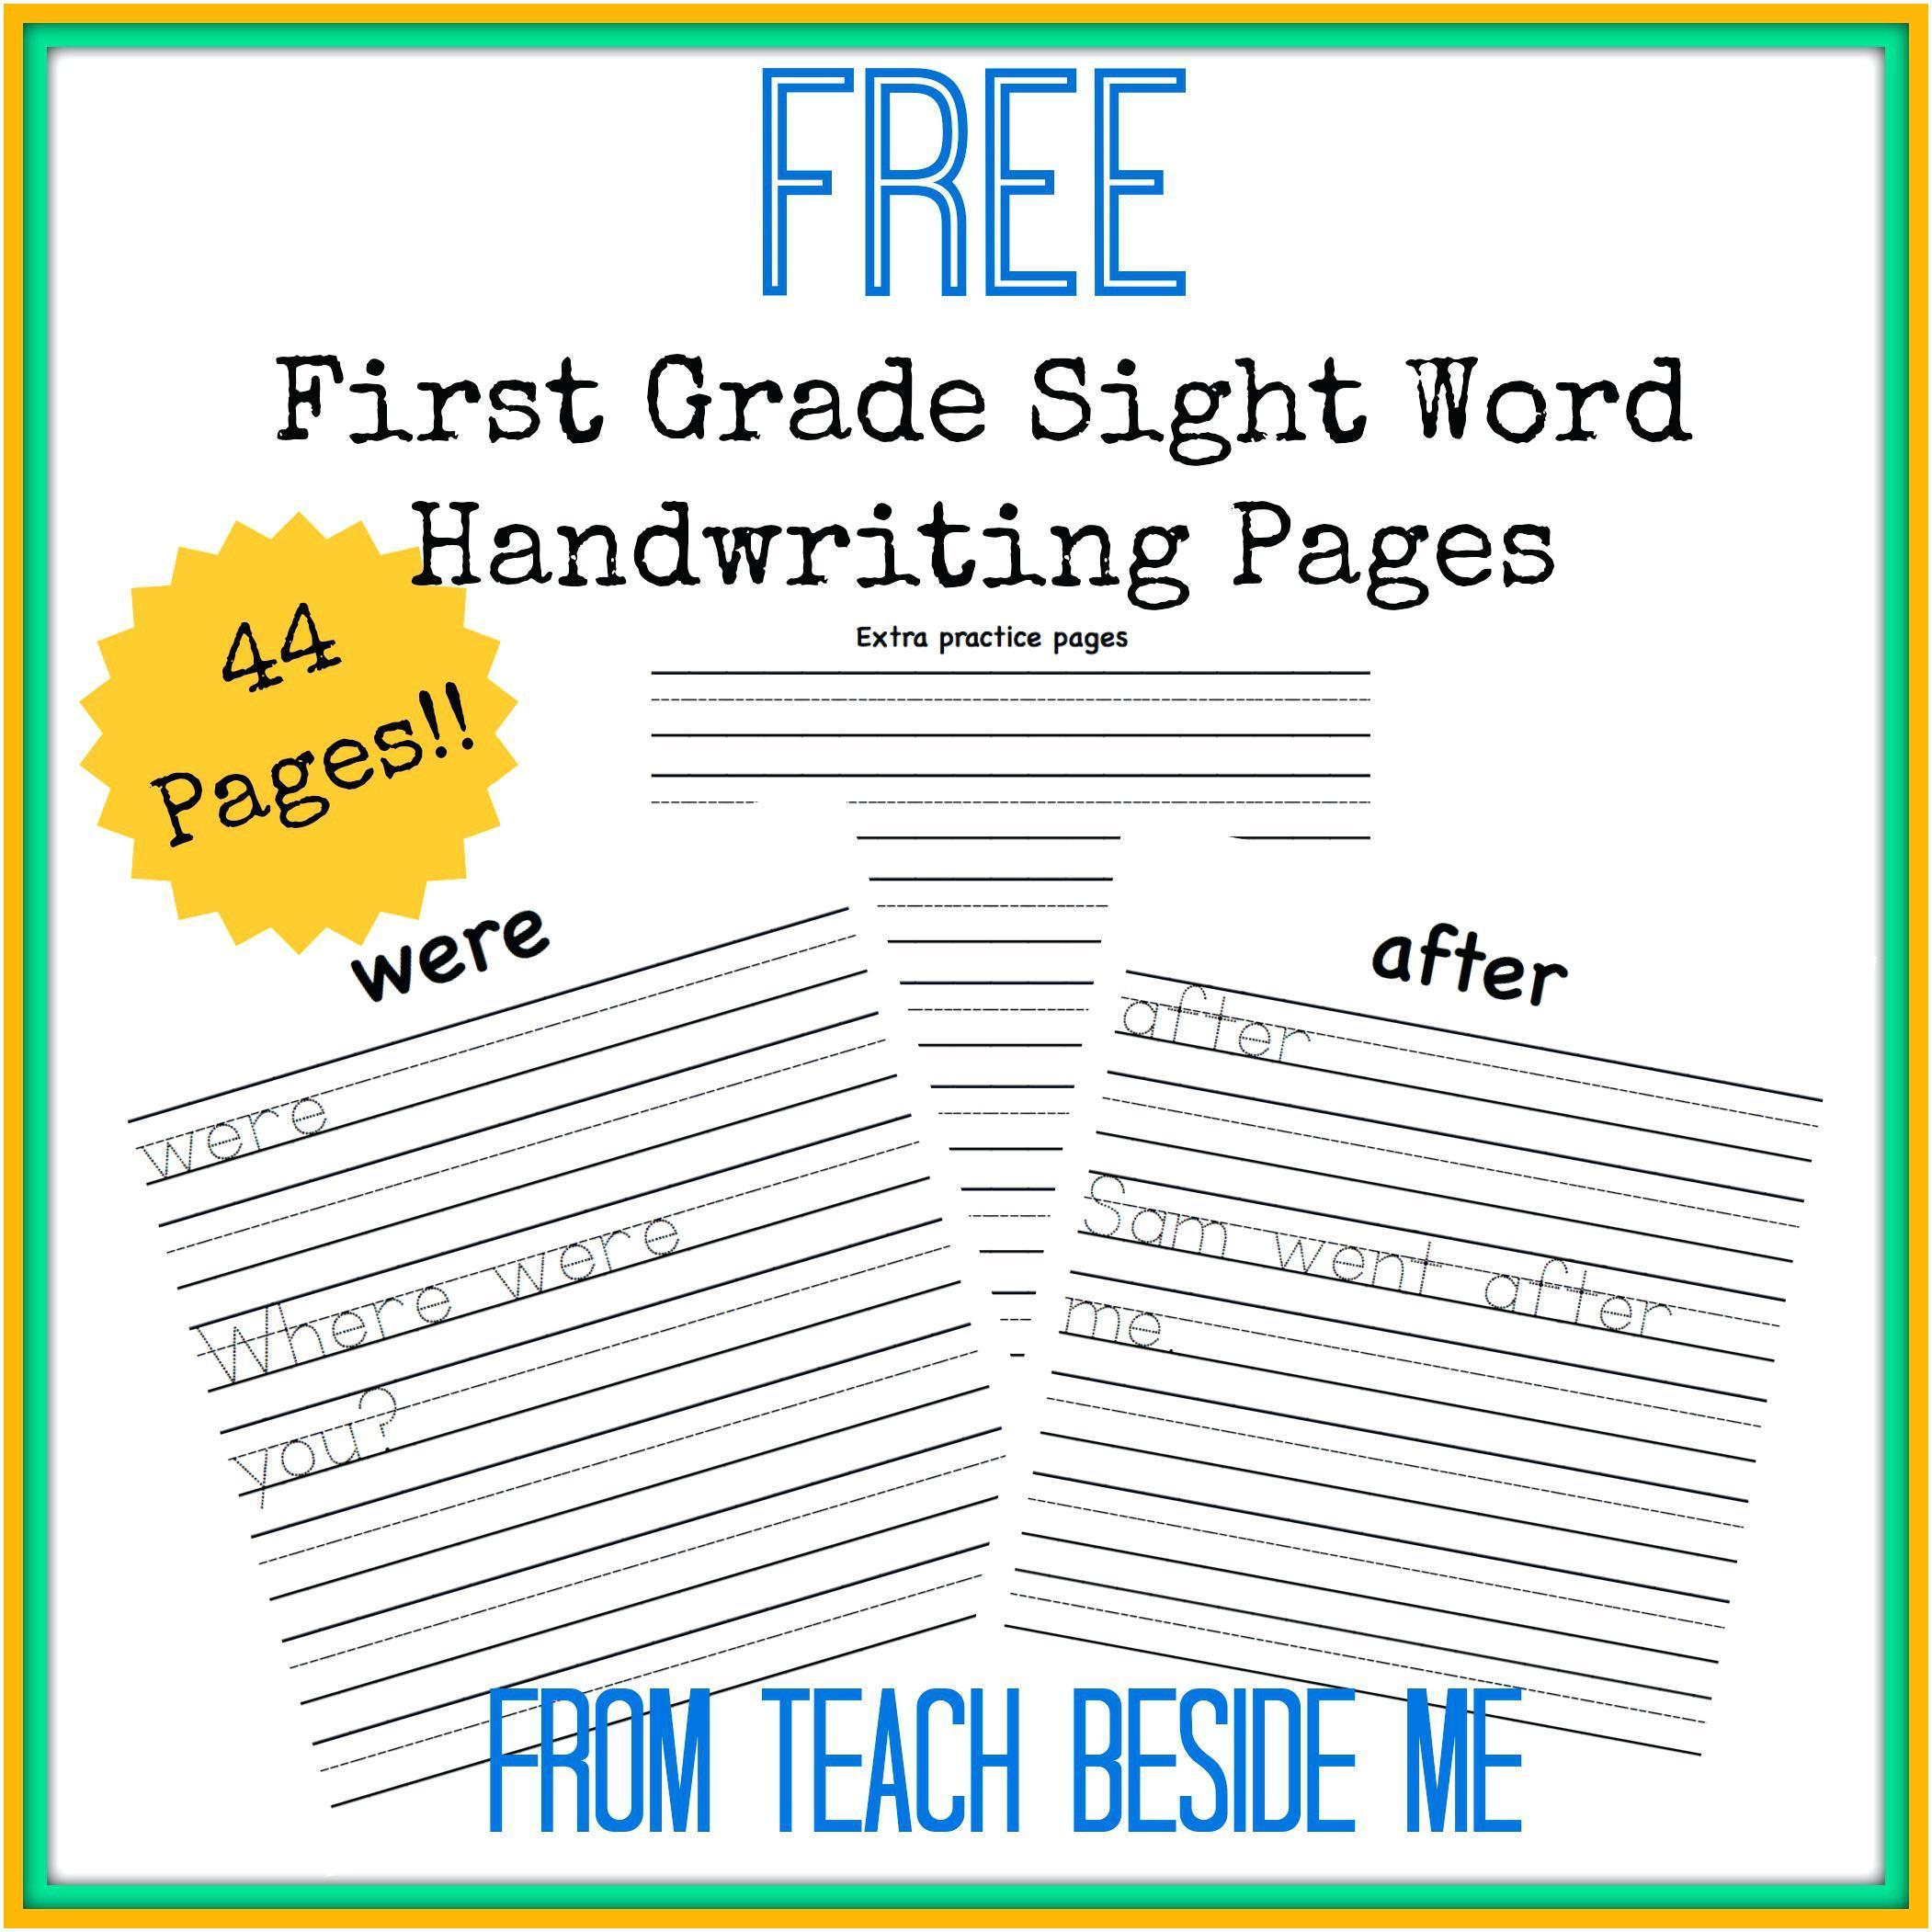 Kindergarten: Easy Esl English Reading Comprehension Worksheets | Free Printable 1St Grade Handwriting Worksheets